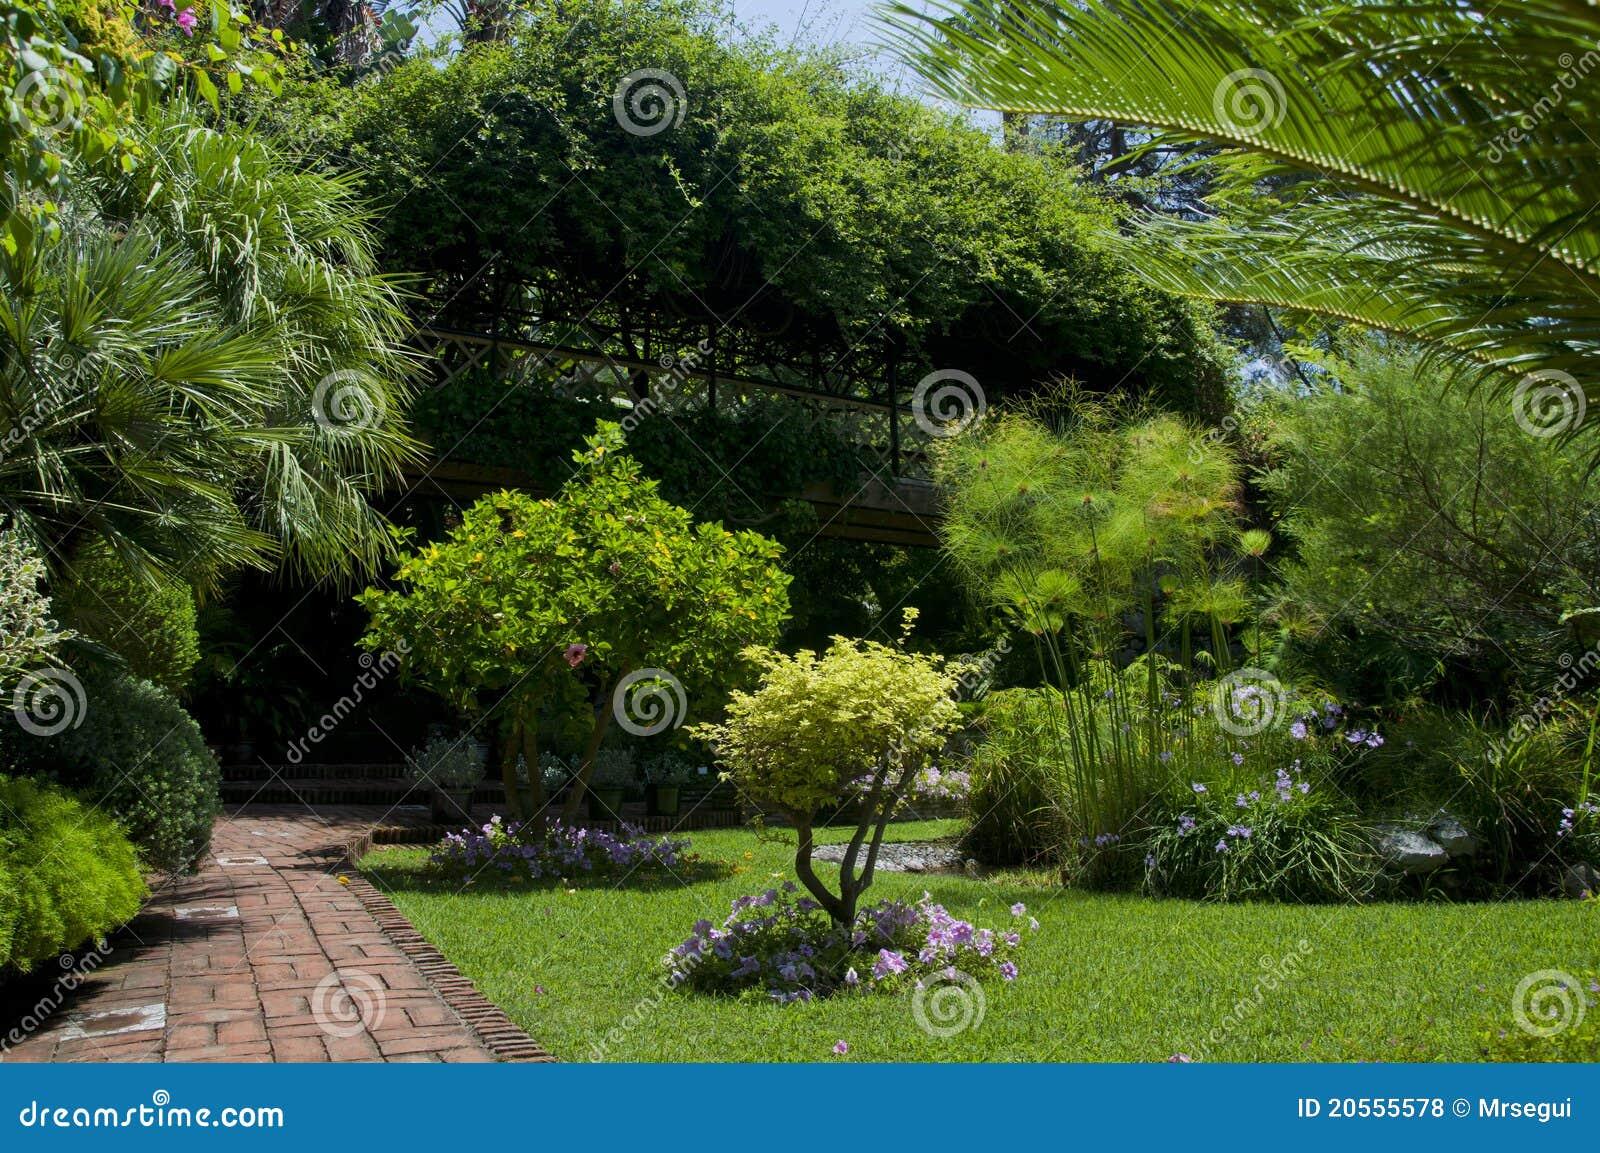 Botanical Garden Royalty Free Stock Photos Image 20555578